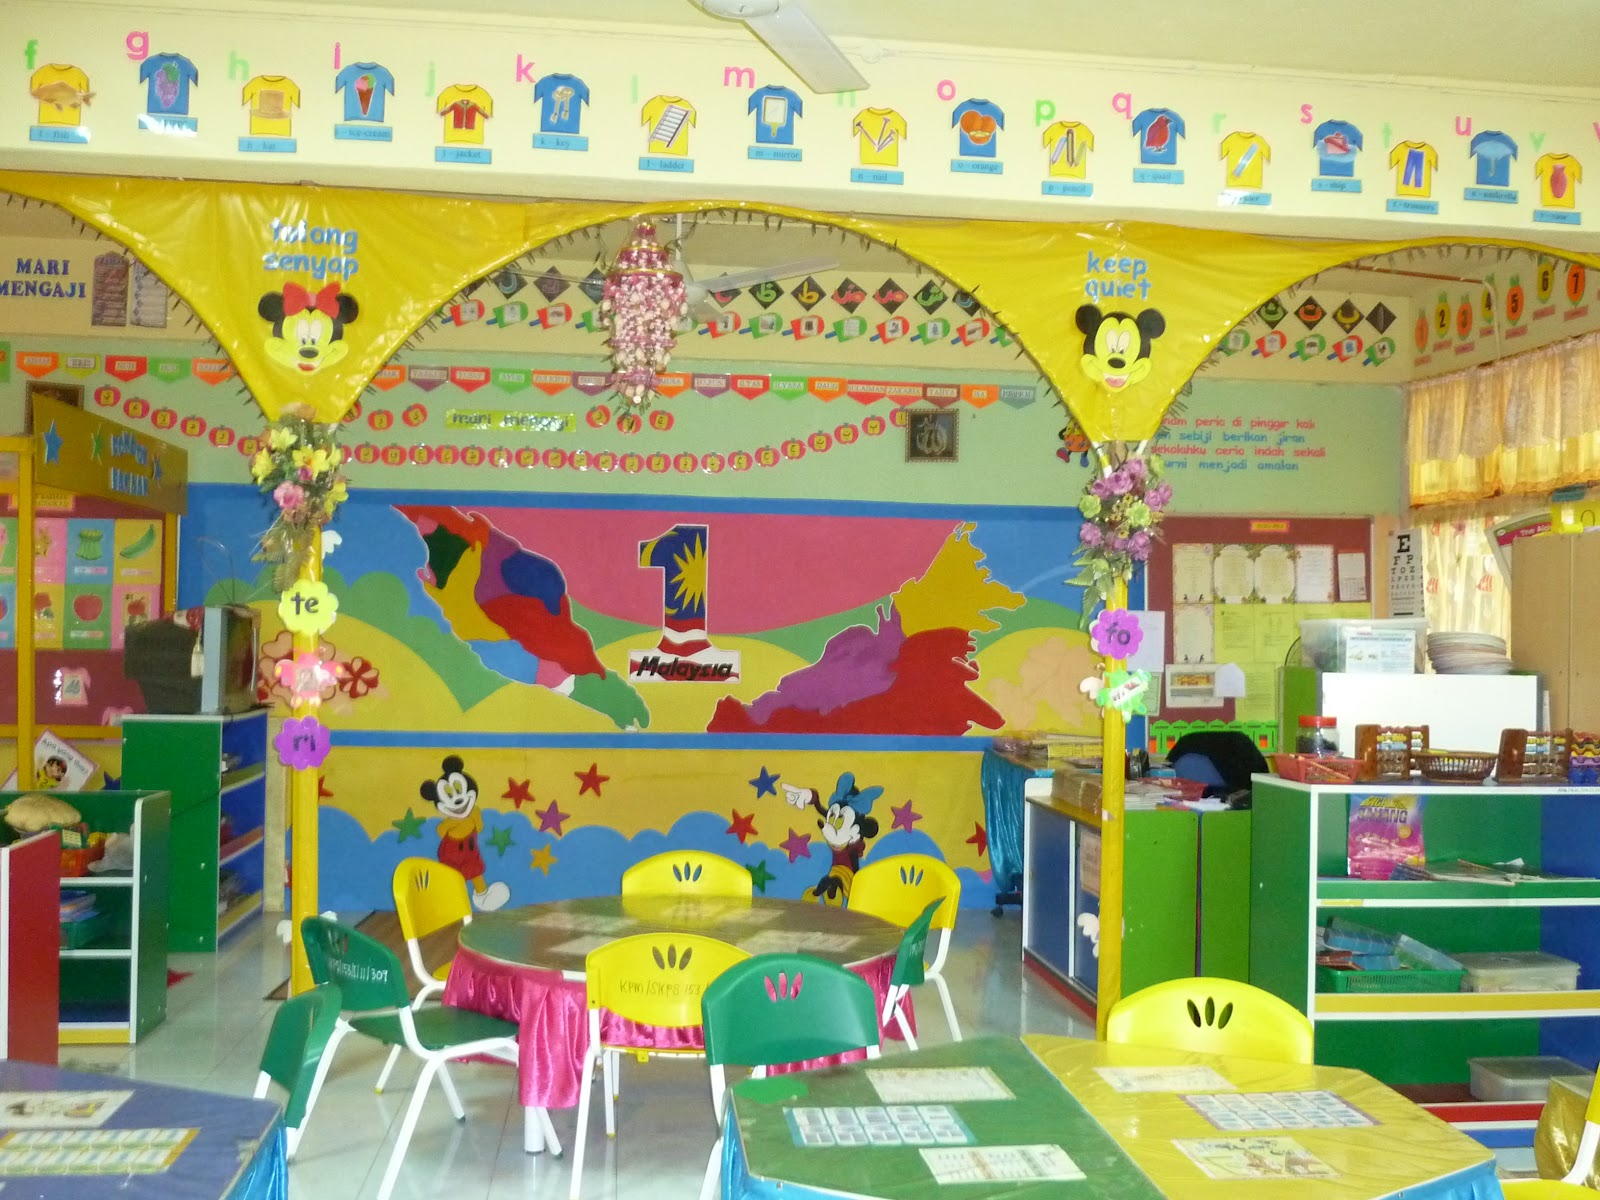 Prasekolah sk pulapah lawatan penanda aras di sk palong 1 for Contoh lukisan mural tadika